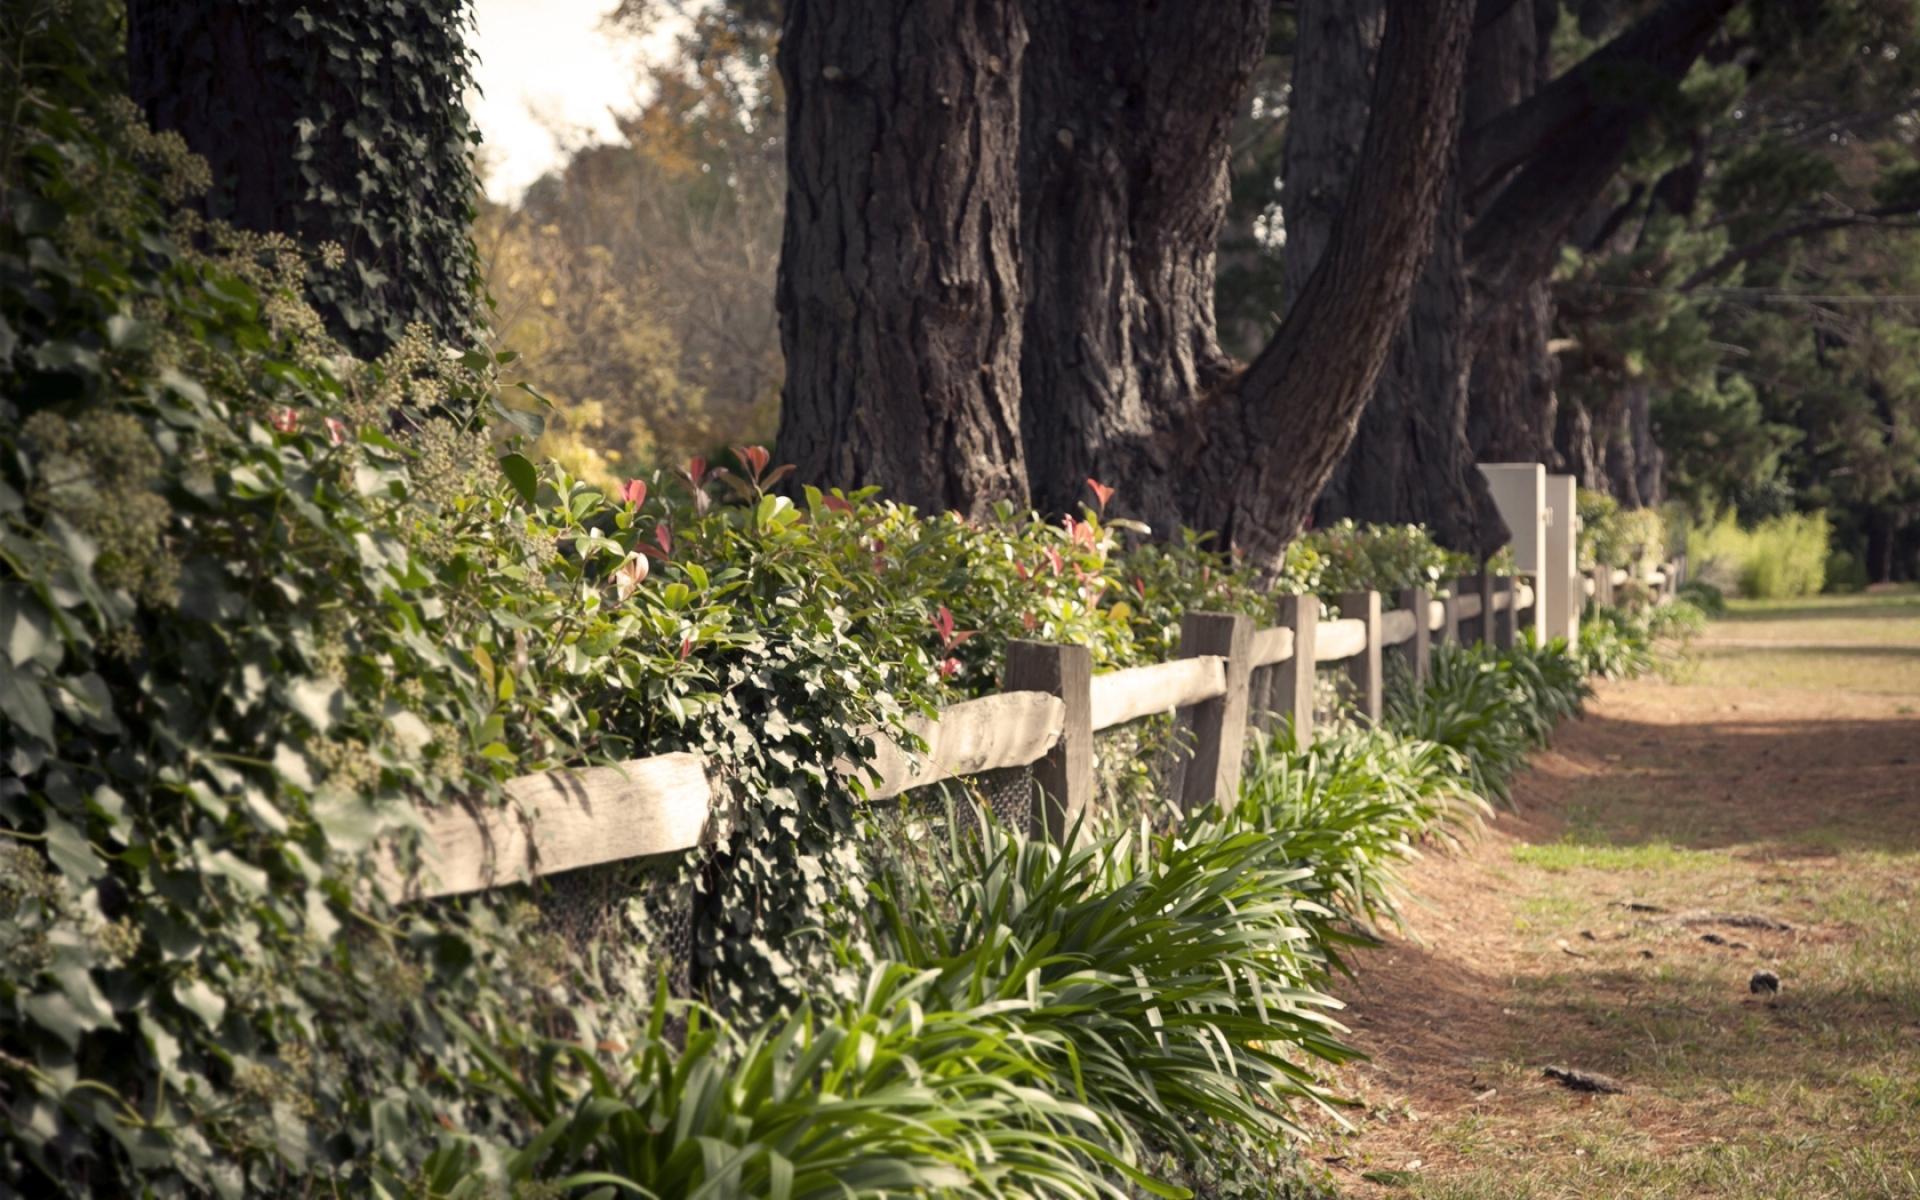 Картинки парк, забор, охрана, трава, земля, дороги, дорожки фото и обои на рабочий стол